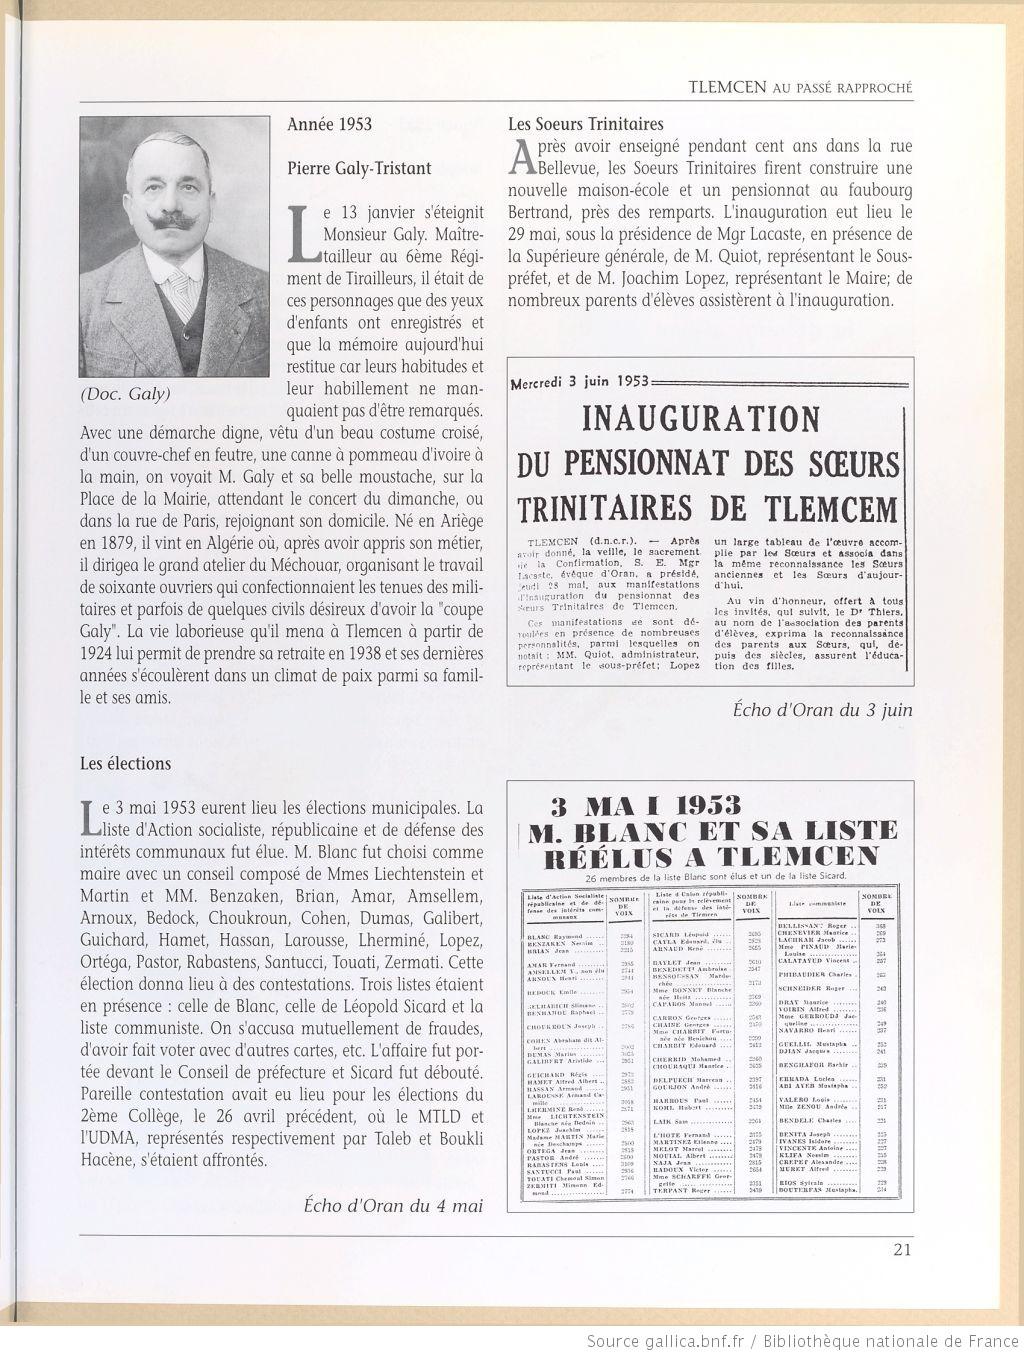 Tlemcen au passe rapproche 1953